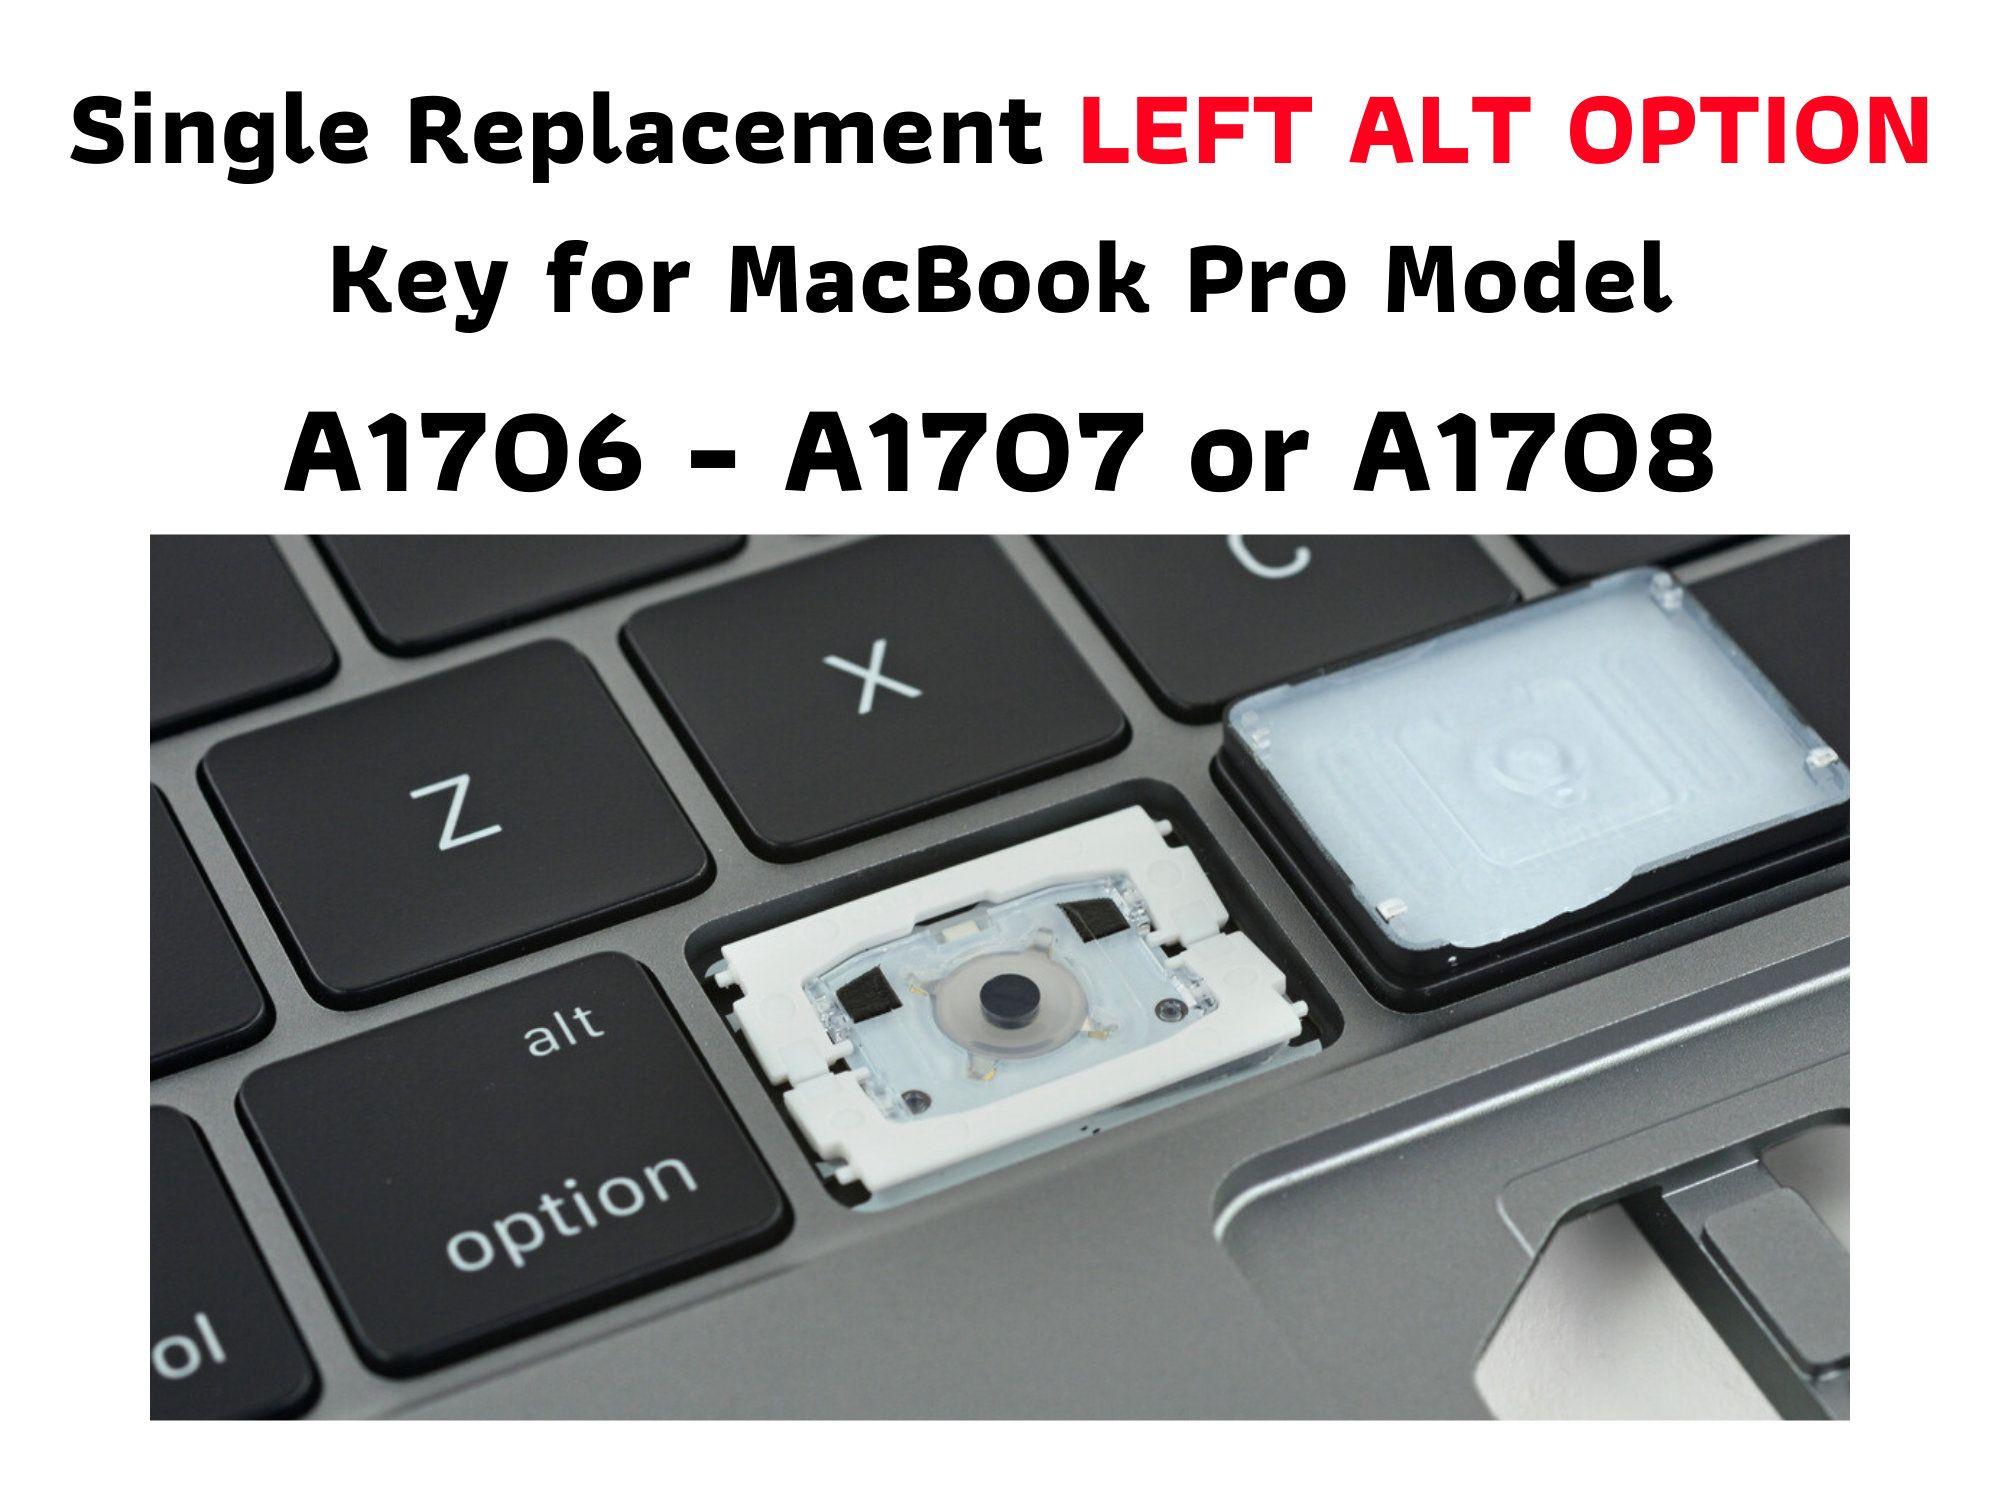 Pin On Macbook Macbook Air Macbook Pro Damaged Screen